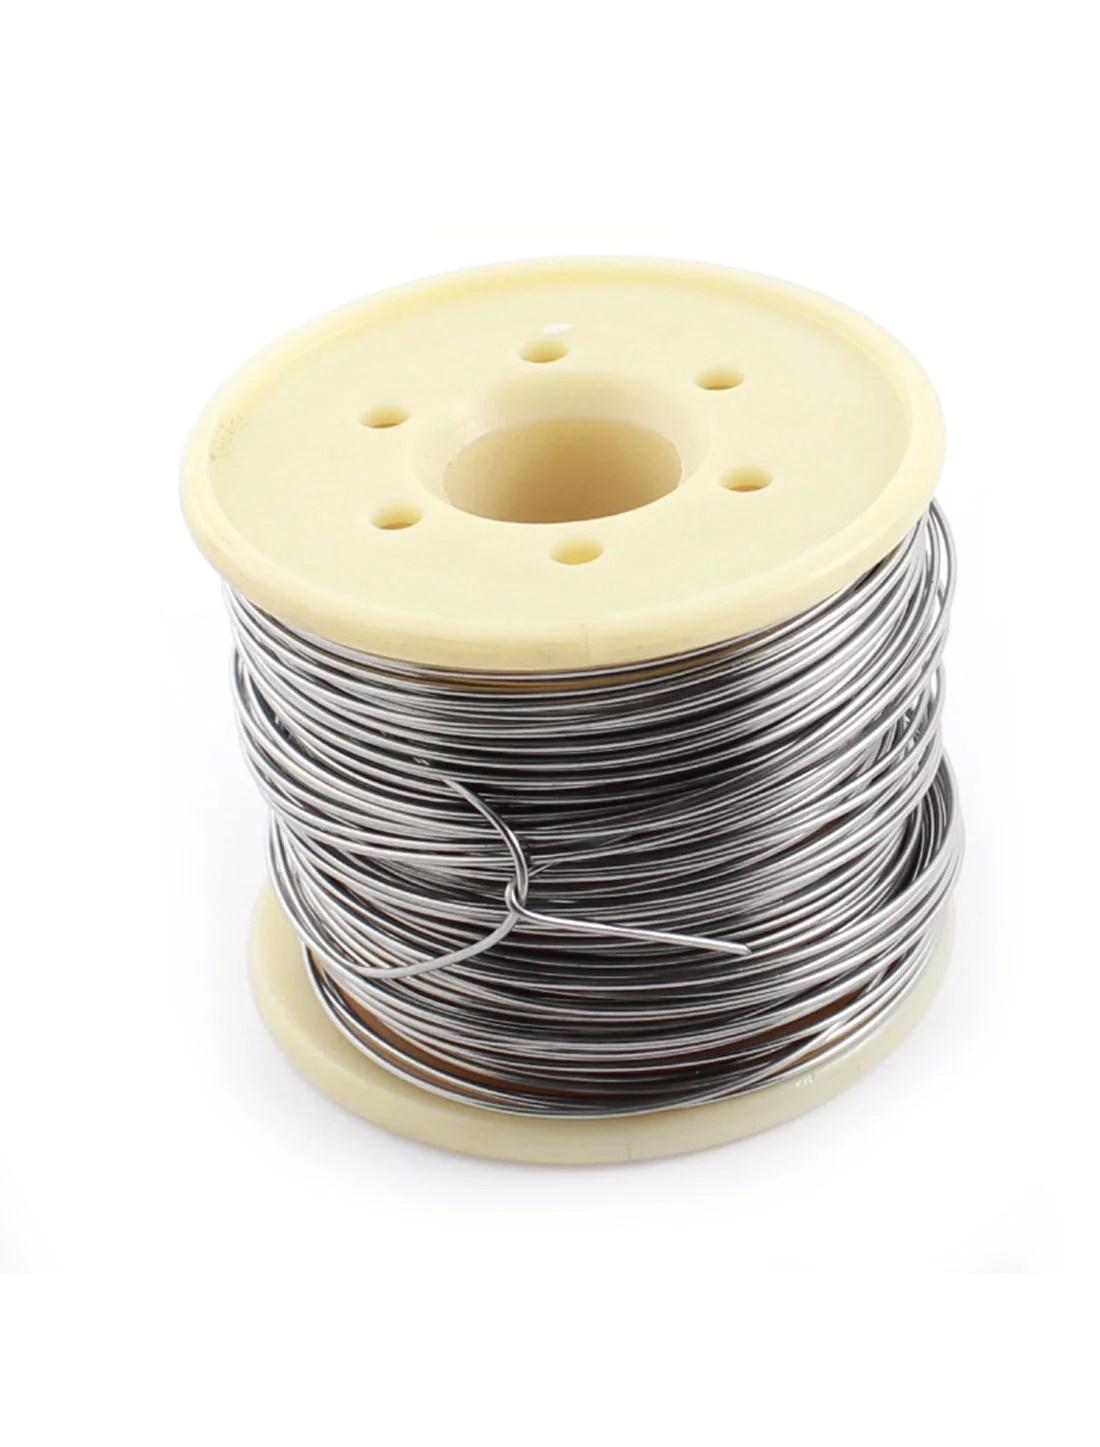 hight resolution of water heaters 30m 0 8mm diameter awg20 20 gauge resistor wire resistance heating cooling air